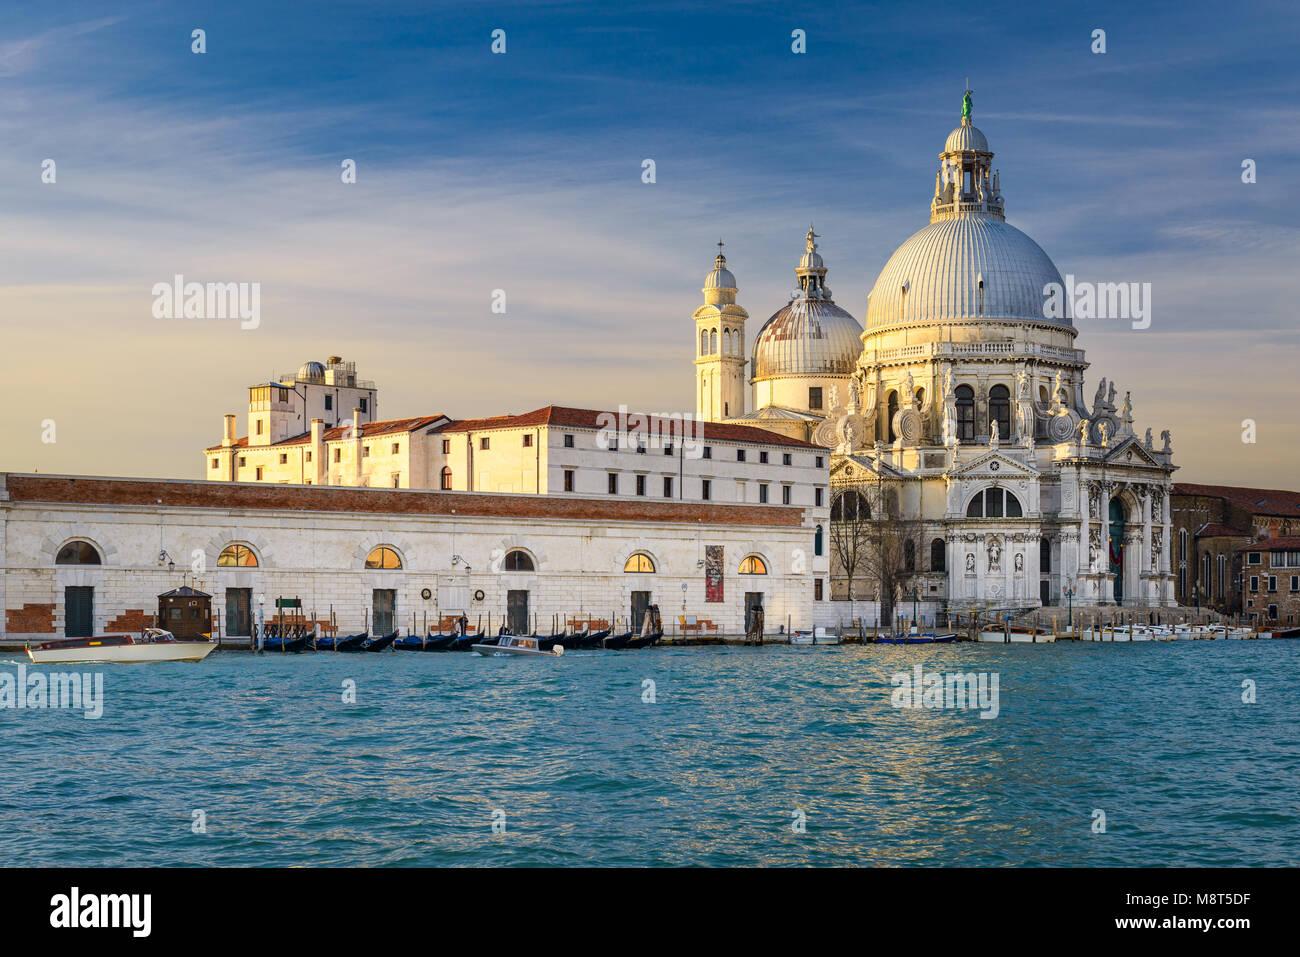 Grand Canal mit Basilika Santa Maria della Salute in Venedig, Italien Stockfoto